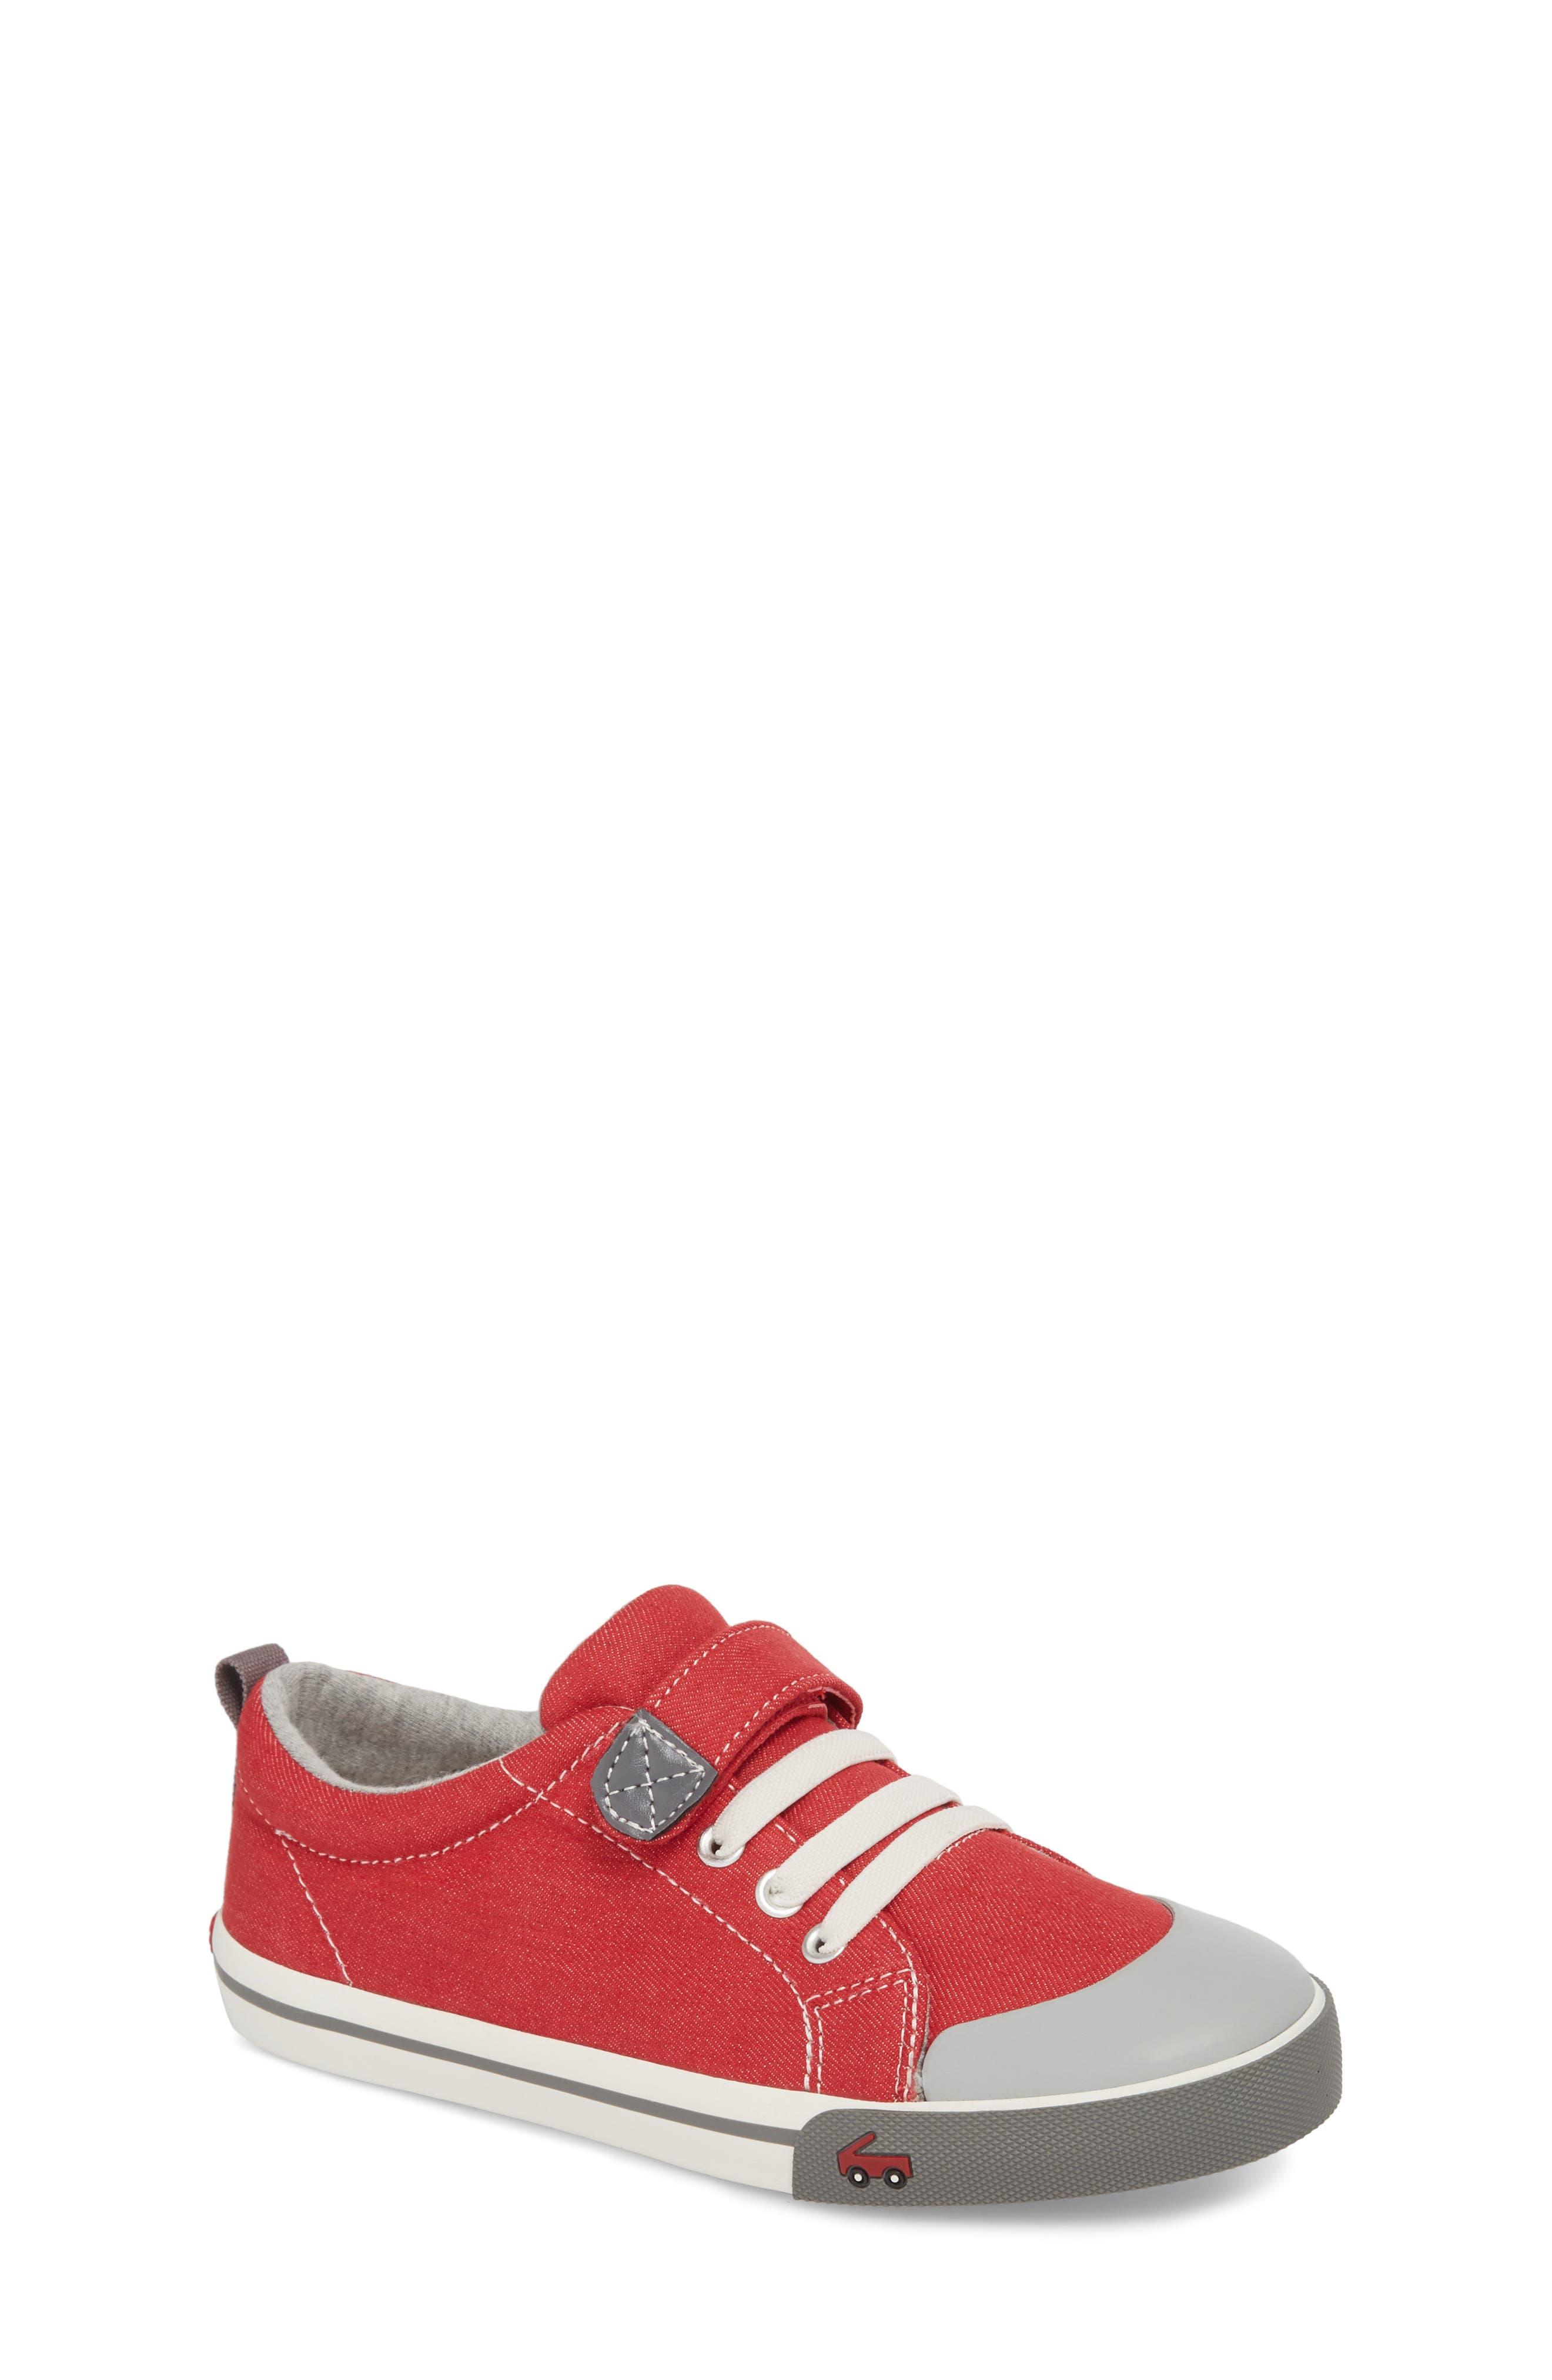 Stevie II Sneaker,                             Main thumbnail 1, color,                             Red/ Gray